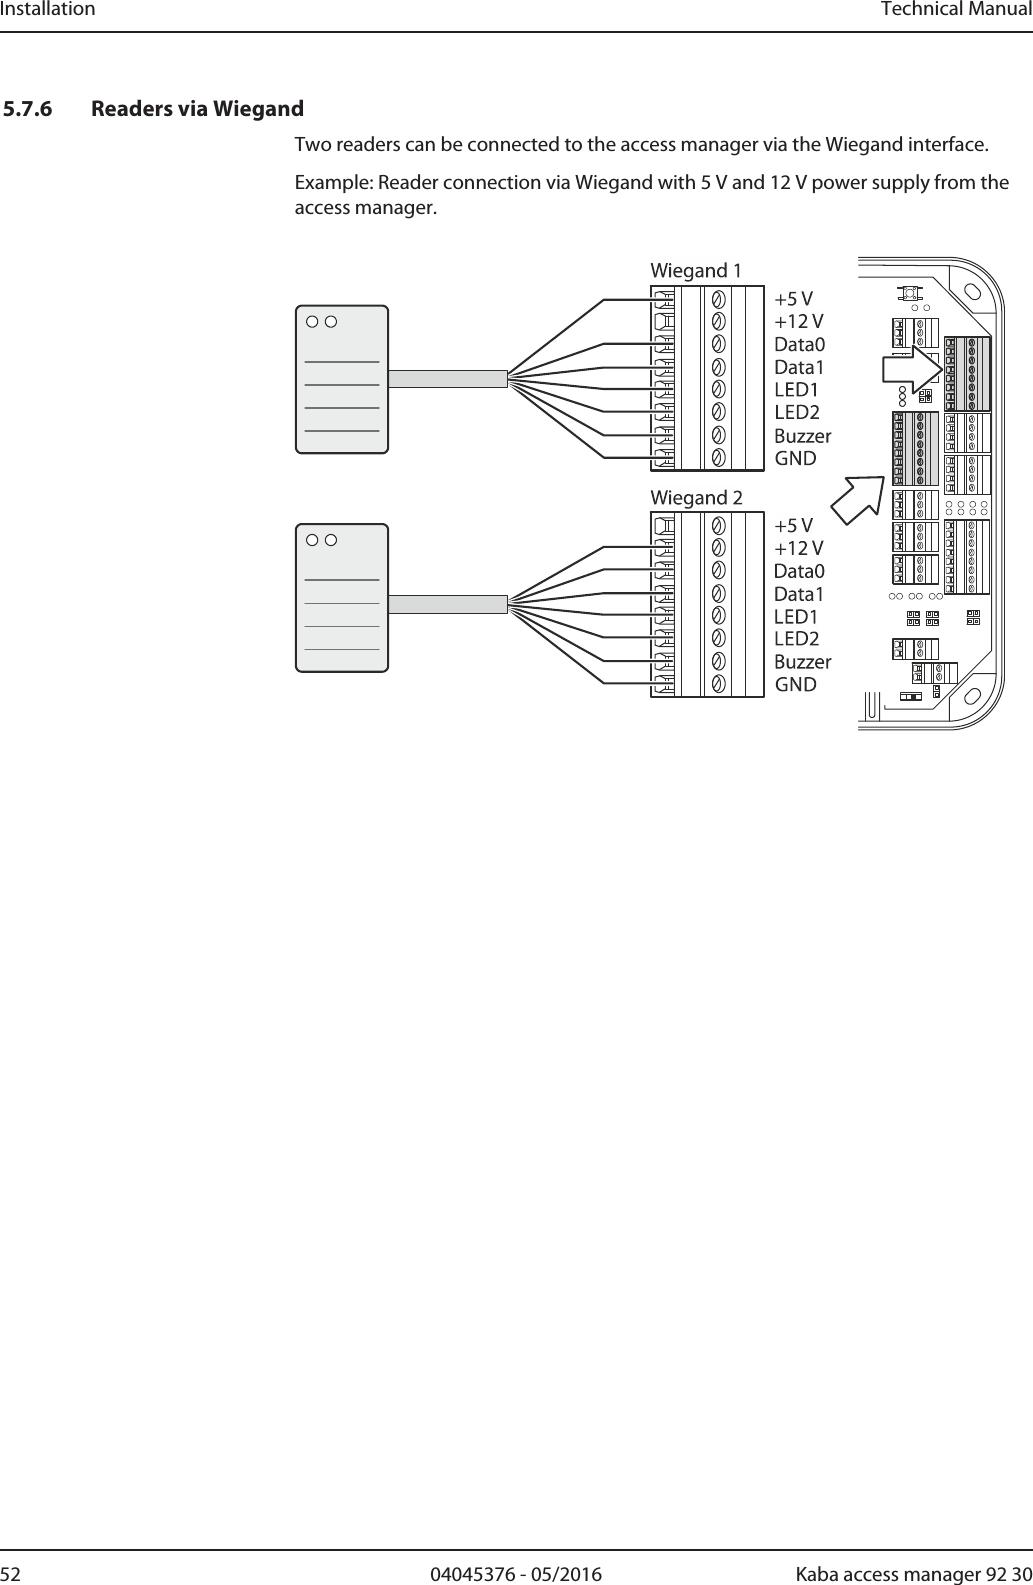 rfid reader wiring diagram